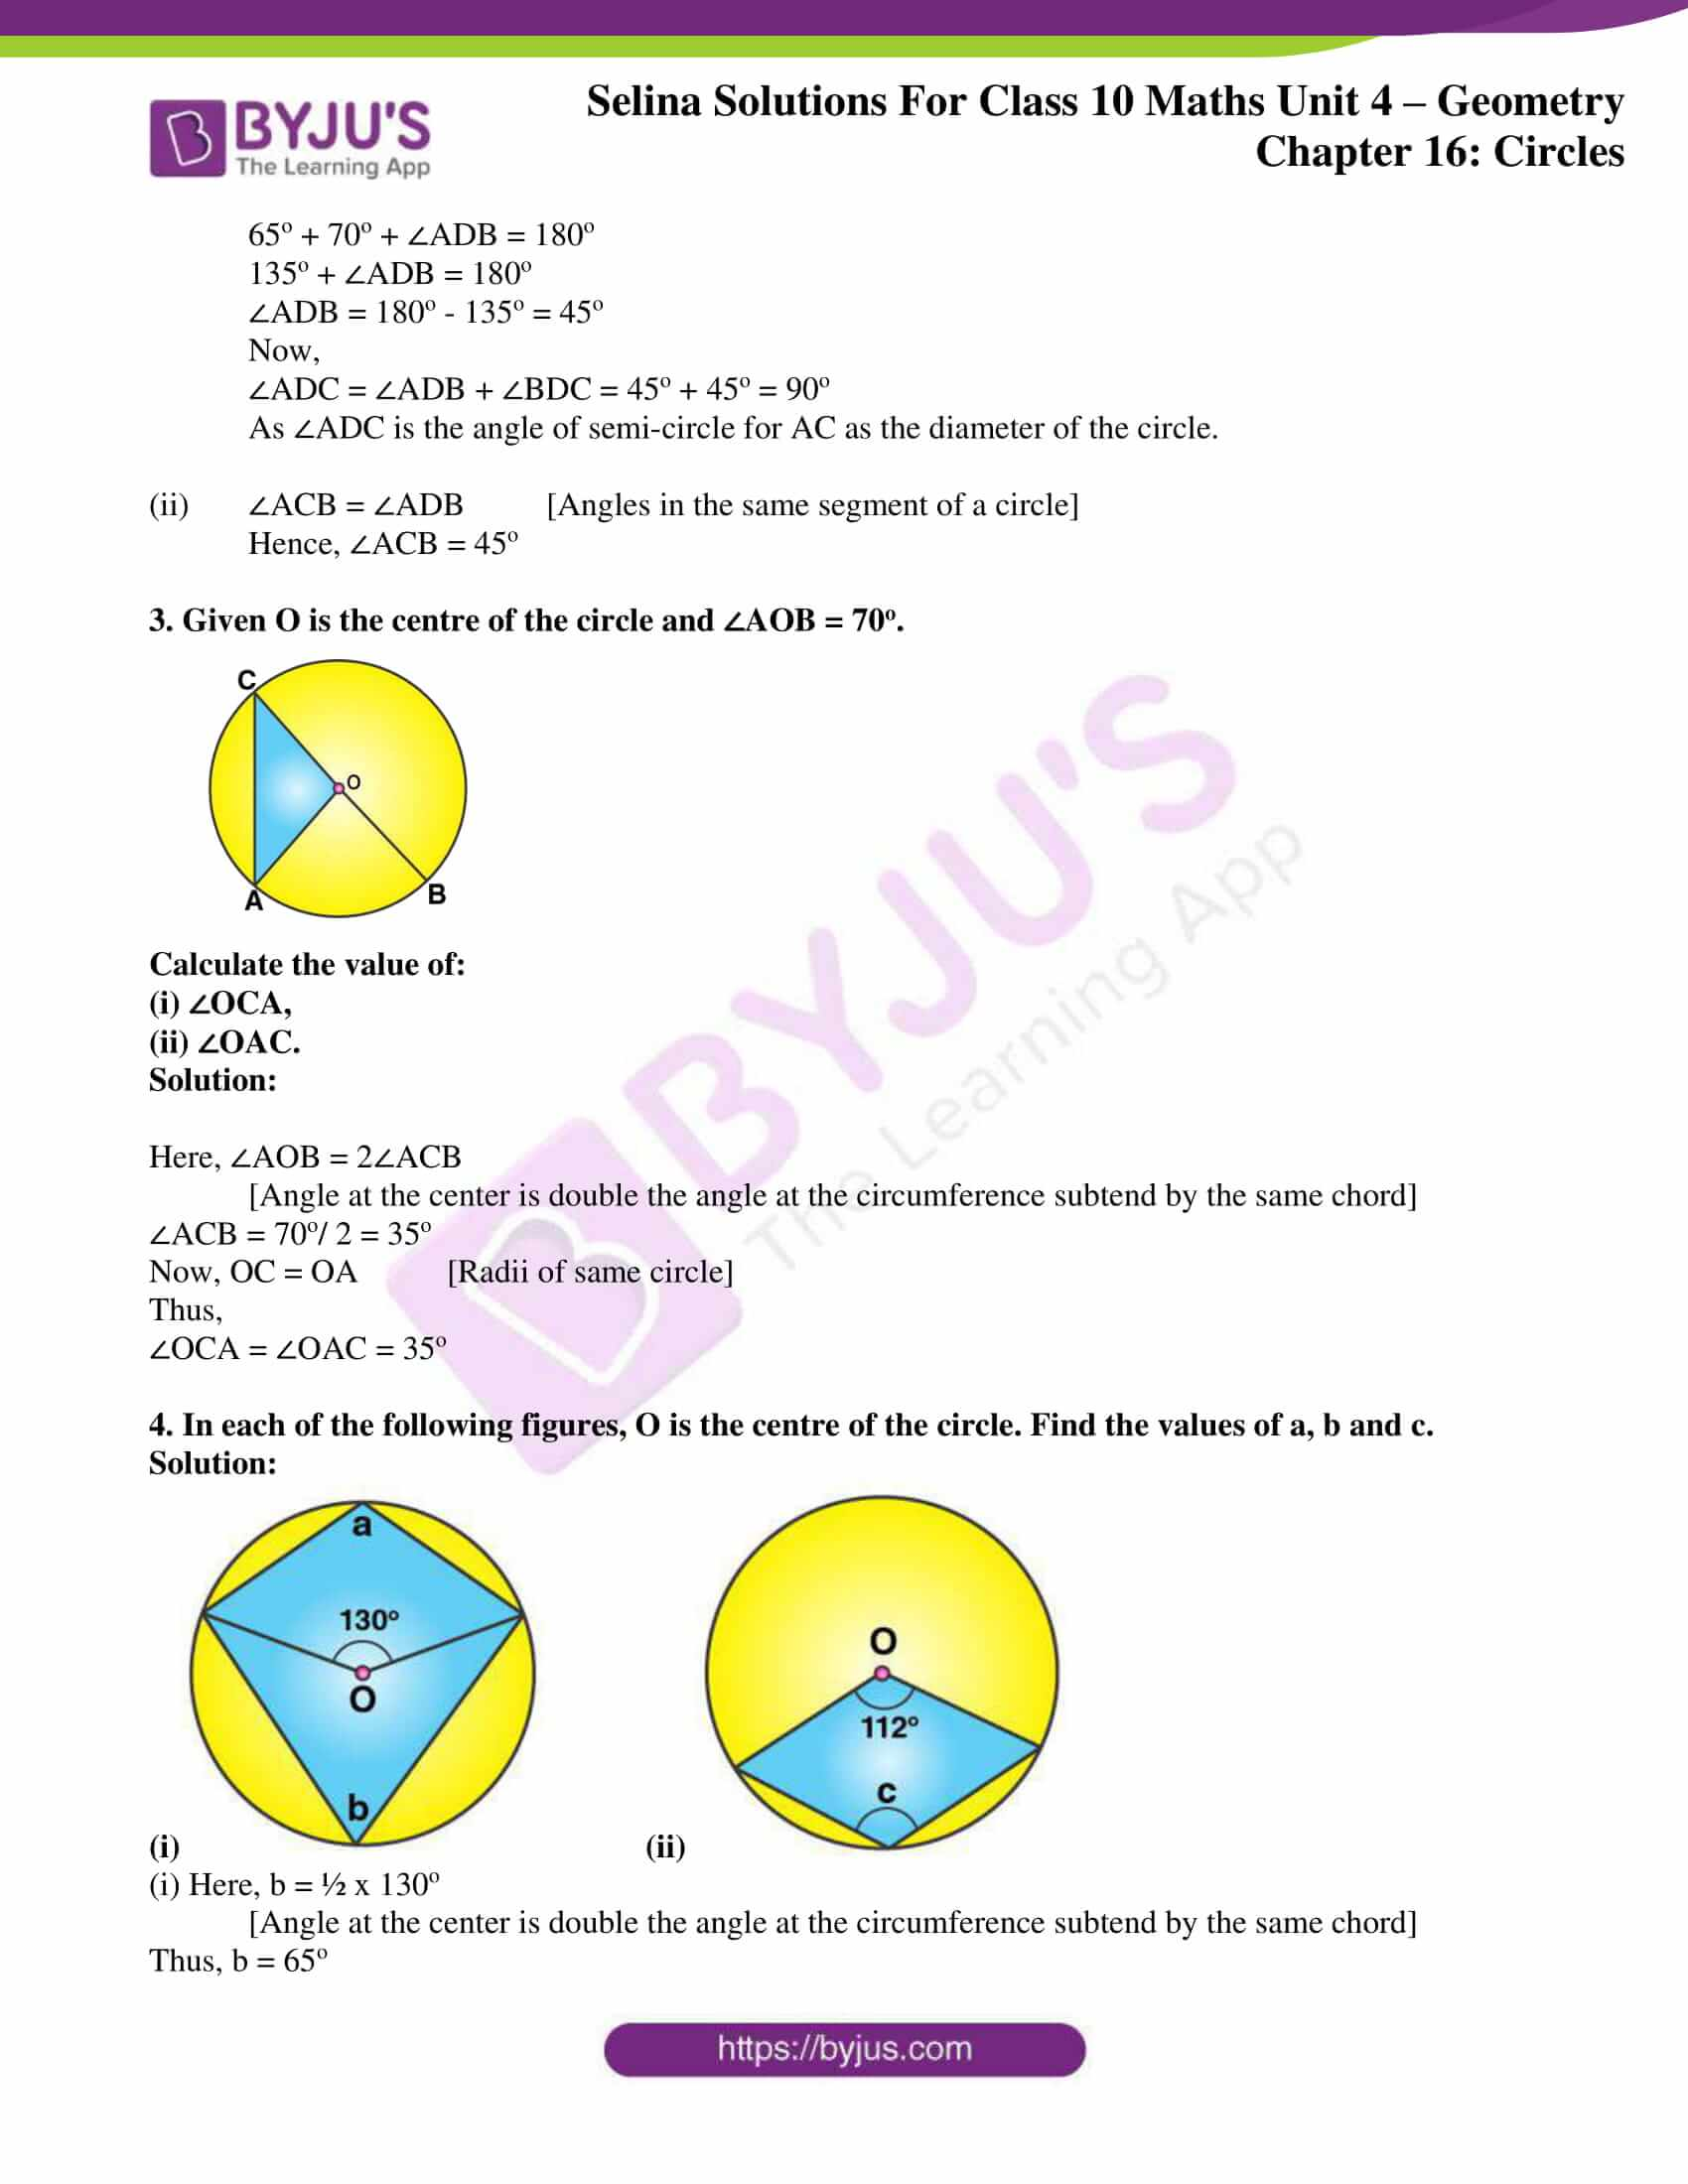 selina-sol-maths-class-10-ch-17-ex-a-02